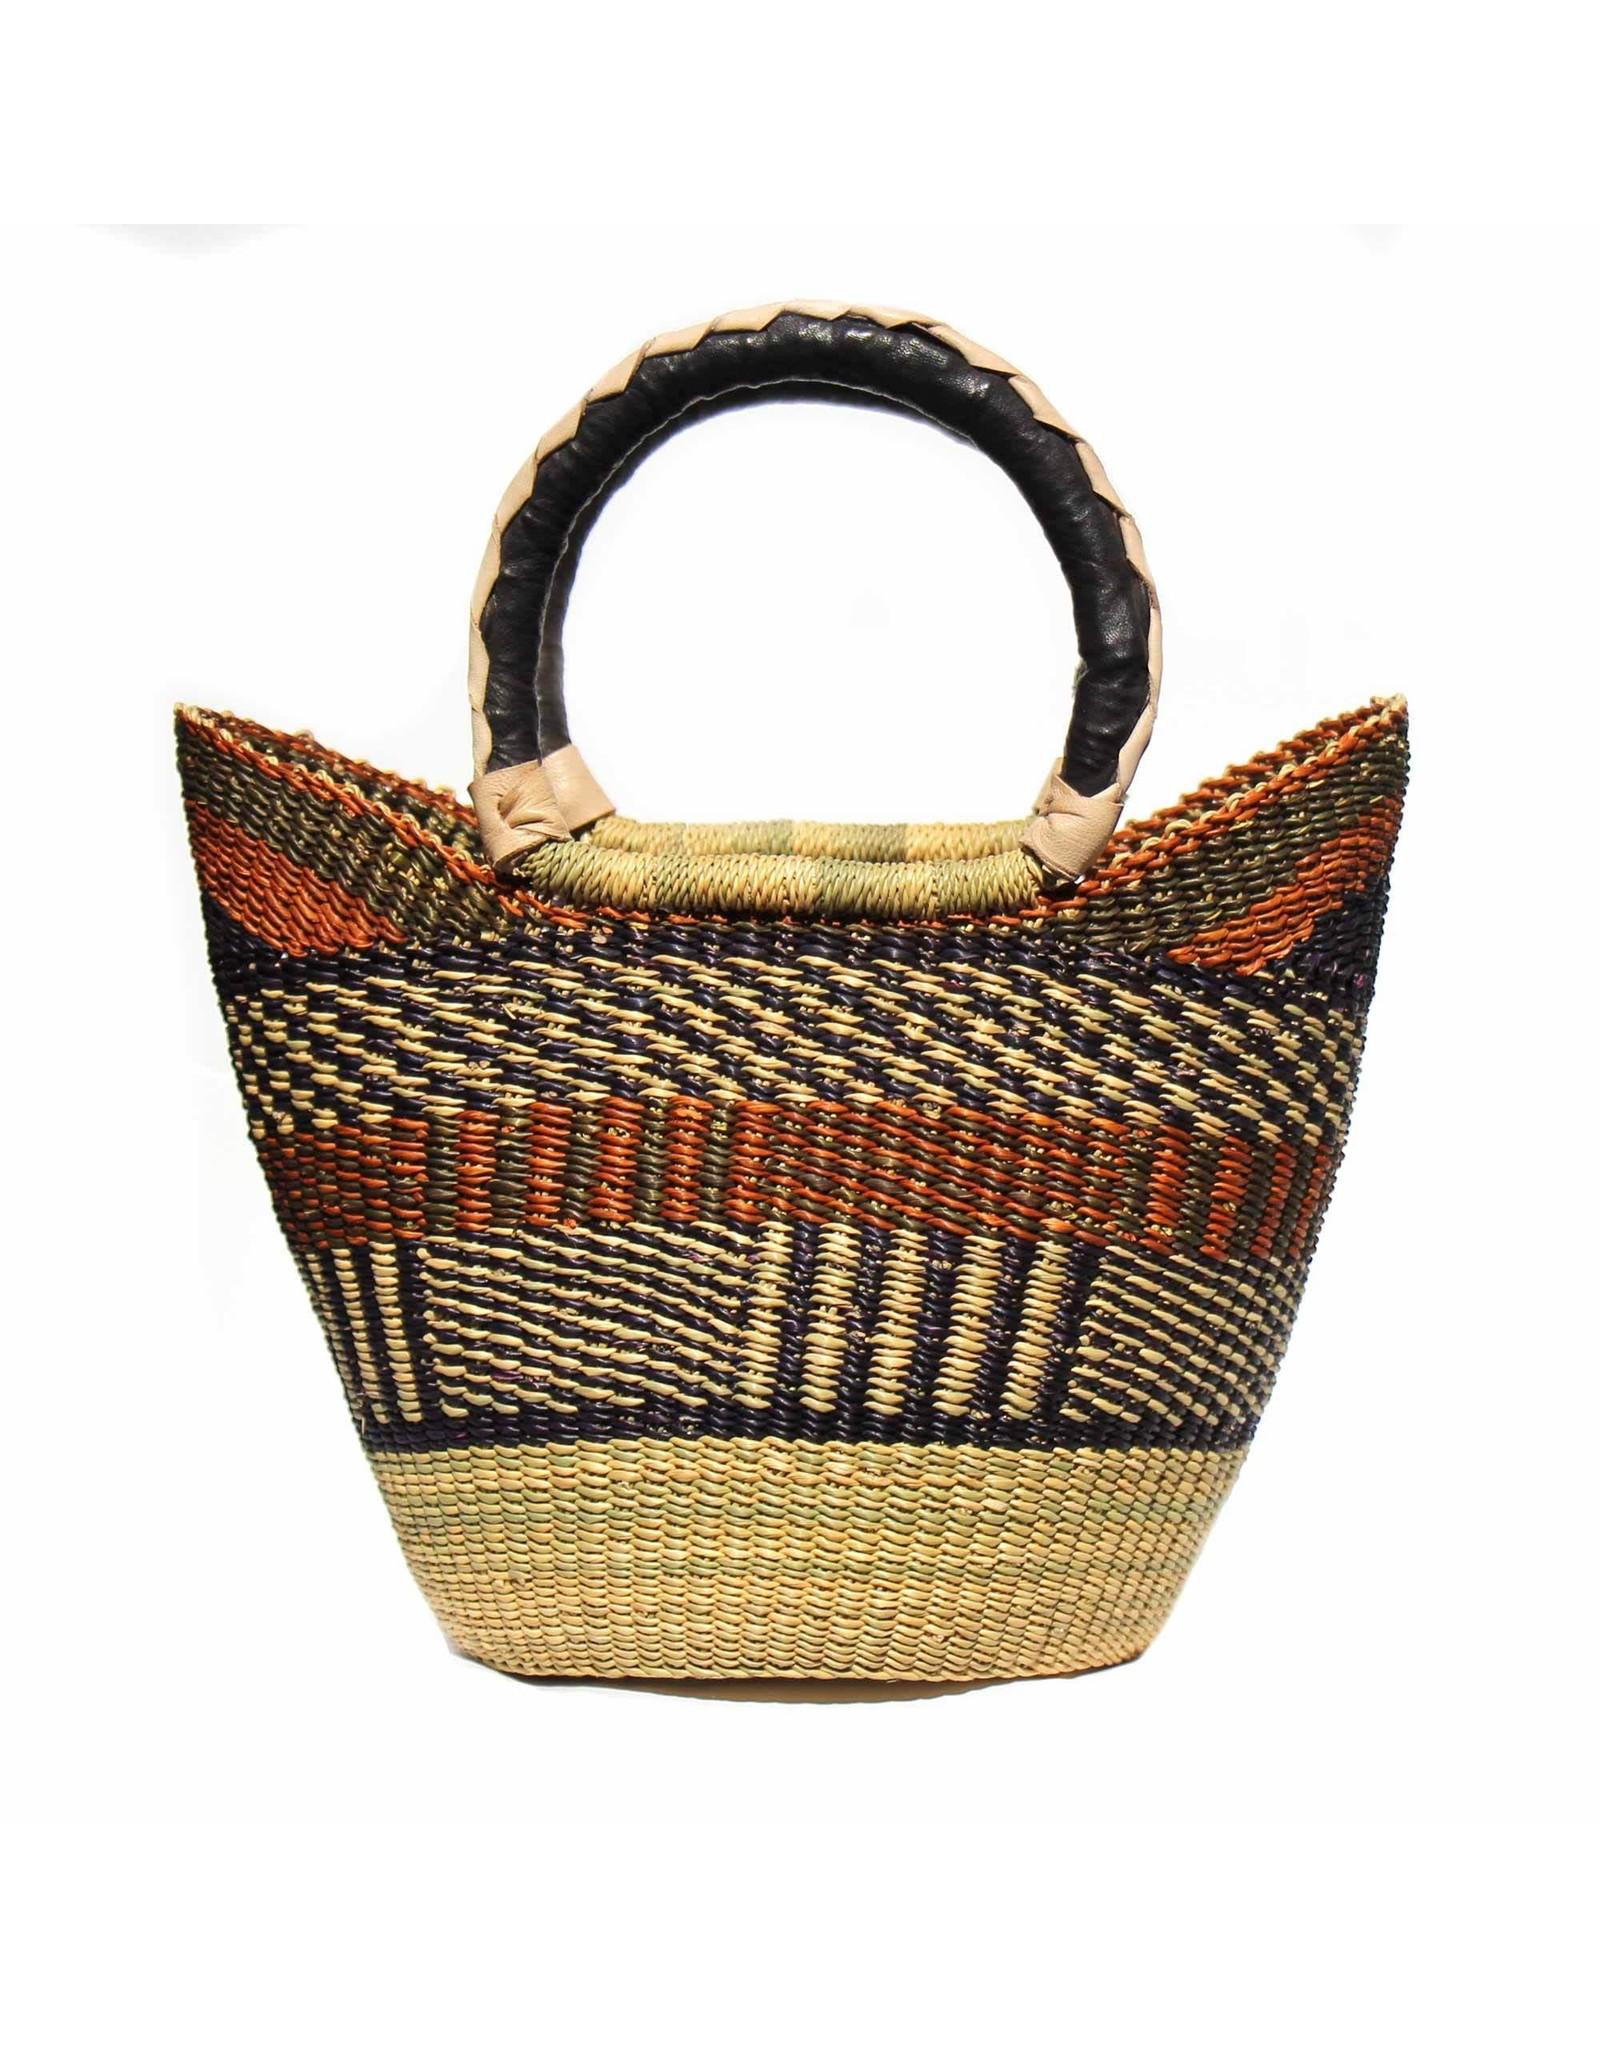 Global Crafts Bolga Tote, Neutral tones. Ghana